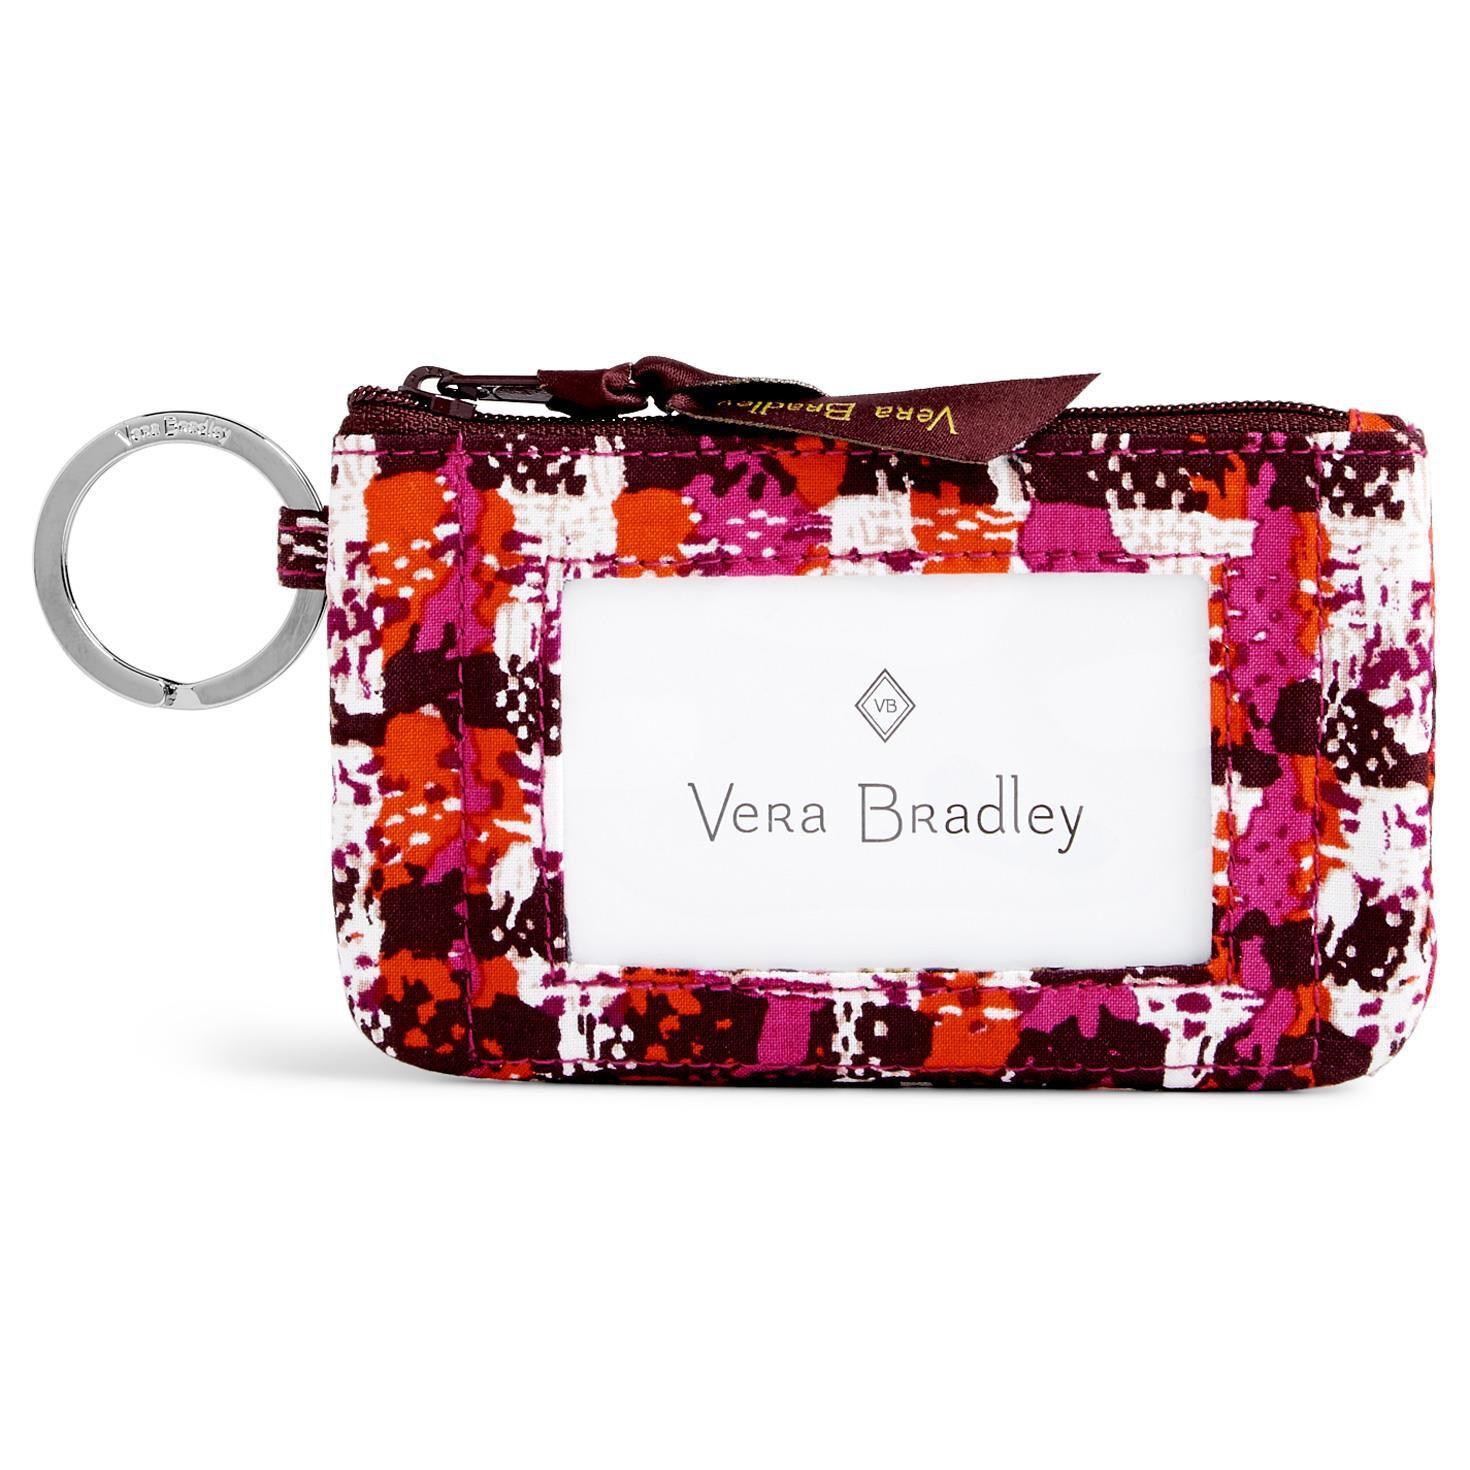 Vera Bradley Zip ID Case in Houndstooth Tweed - Handbags & Purses ...